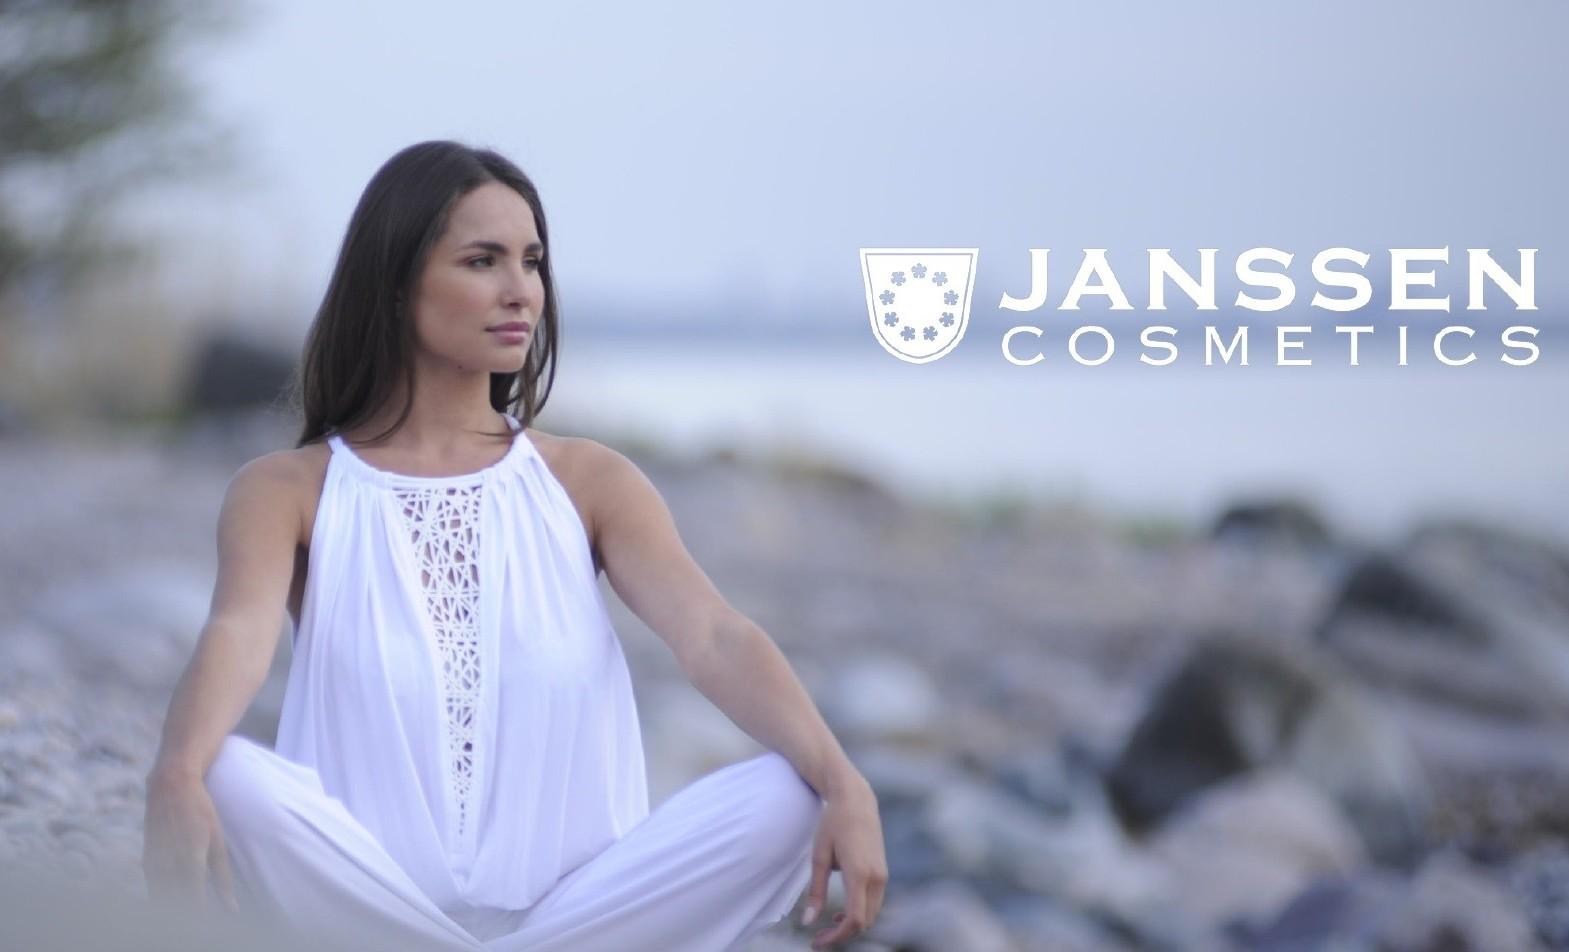 Janssen kozmetikumok